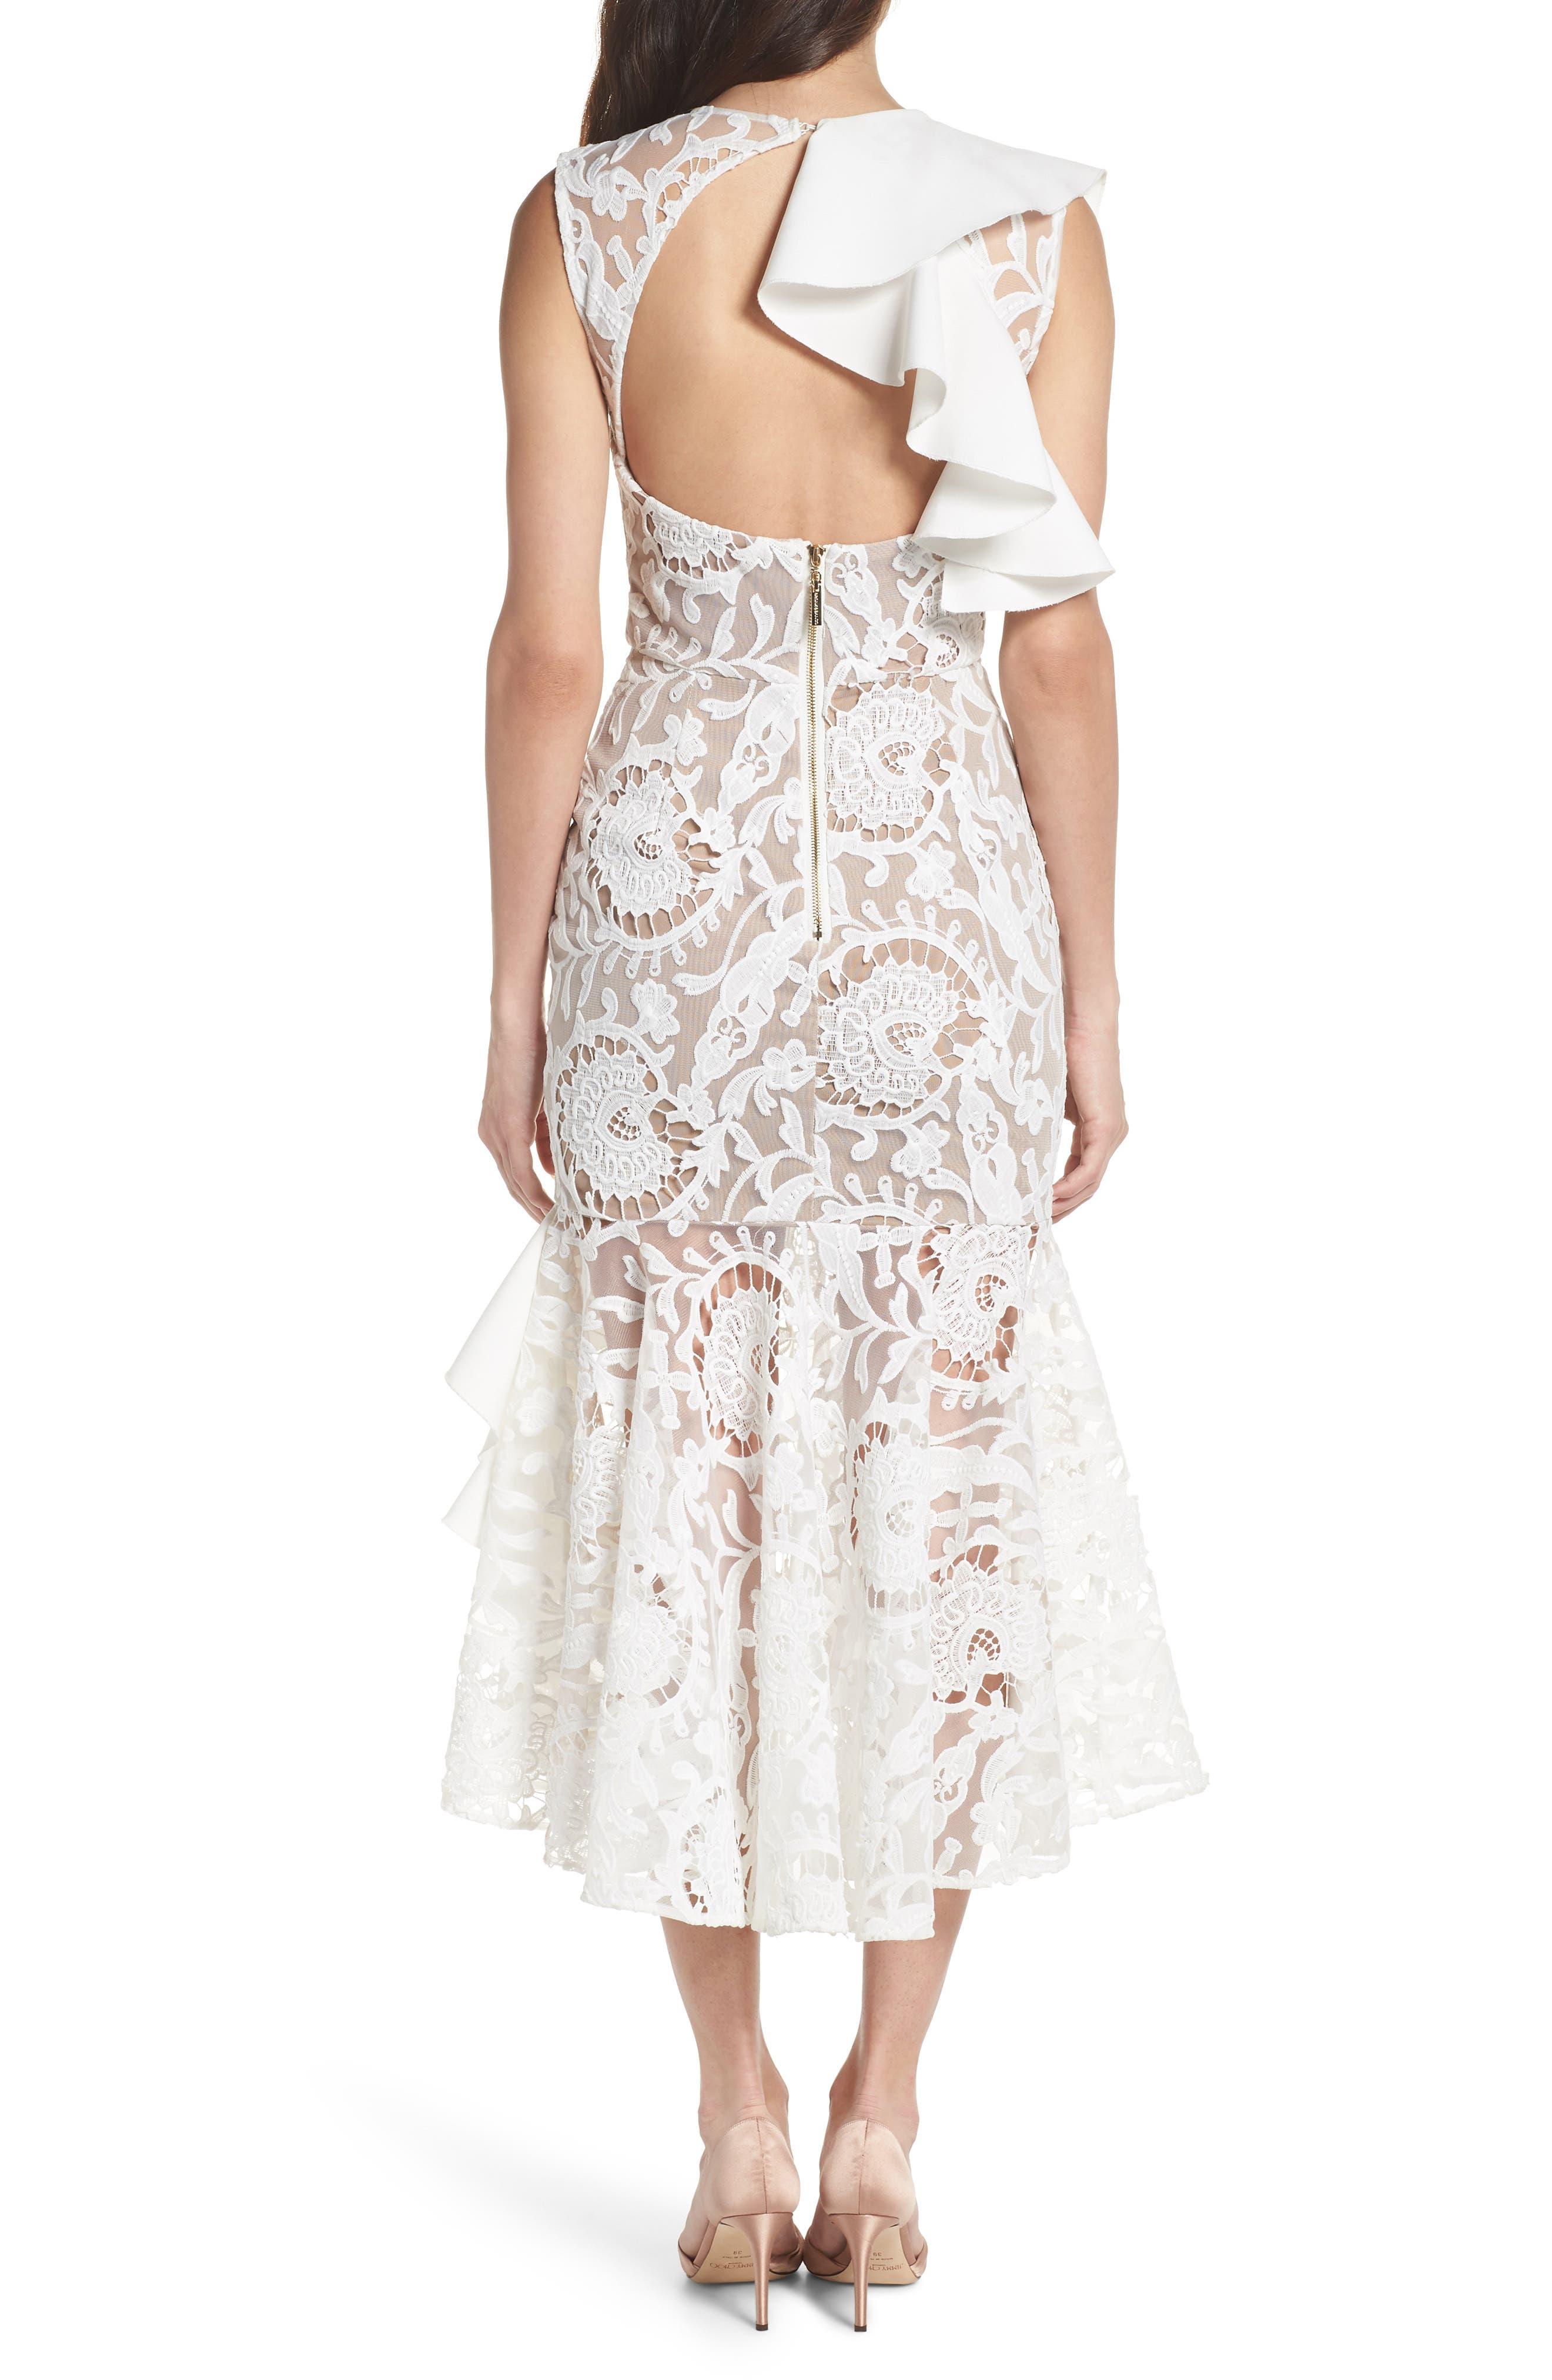 Rocha Waterfall Ruffle Lace Midi Dress,                             Alternate thumbnail 2, color,                             White